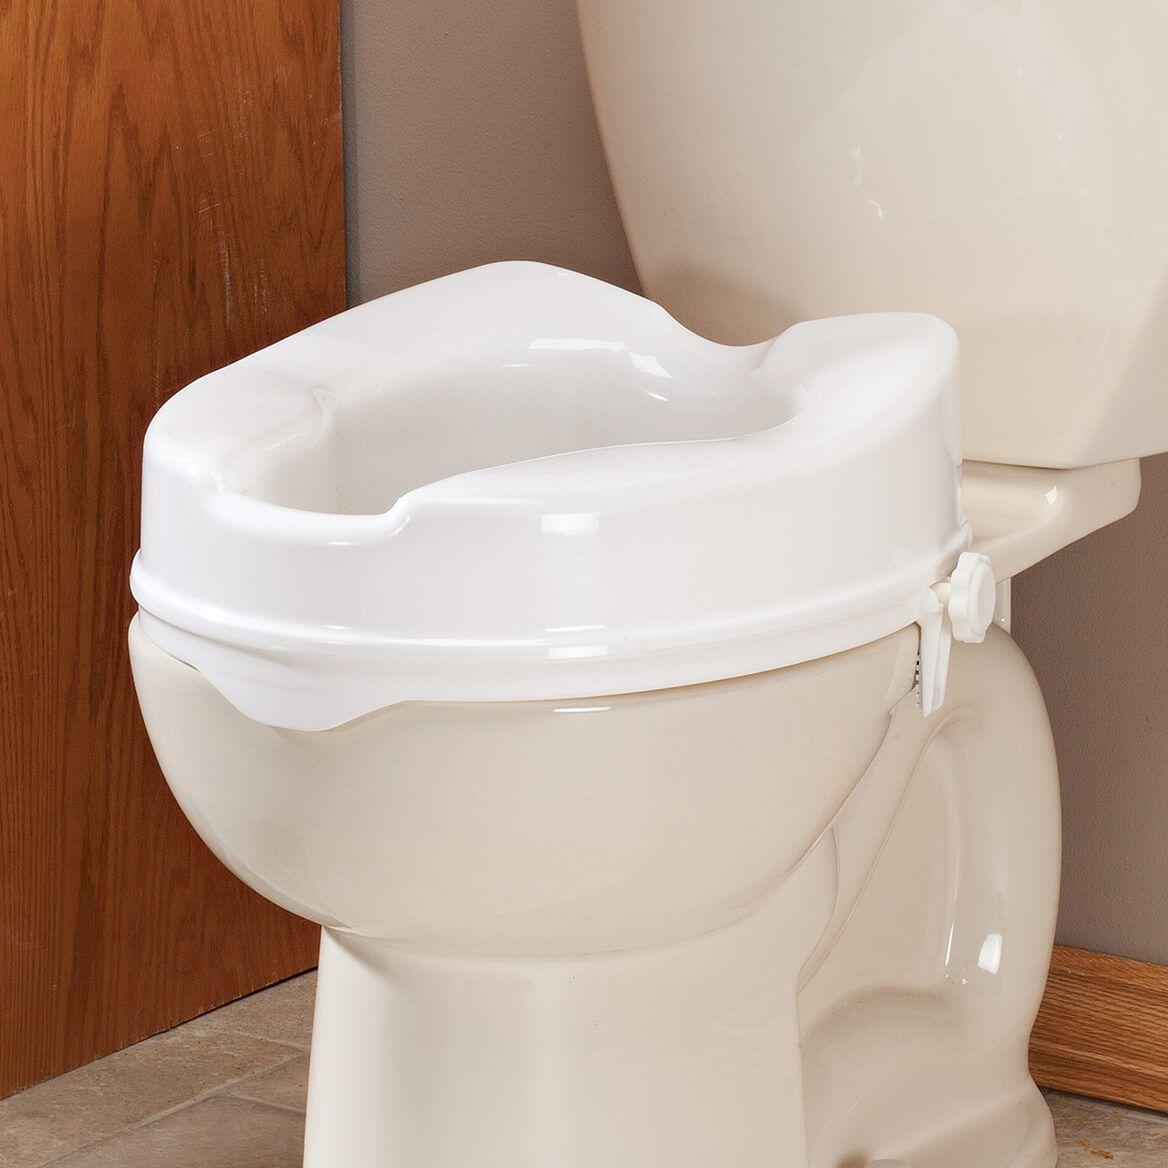 Raised Toilet Seat Handicap Toilet Toilet Personal Hygiene